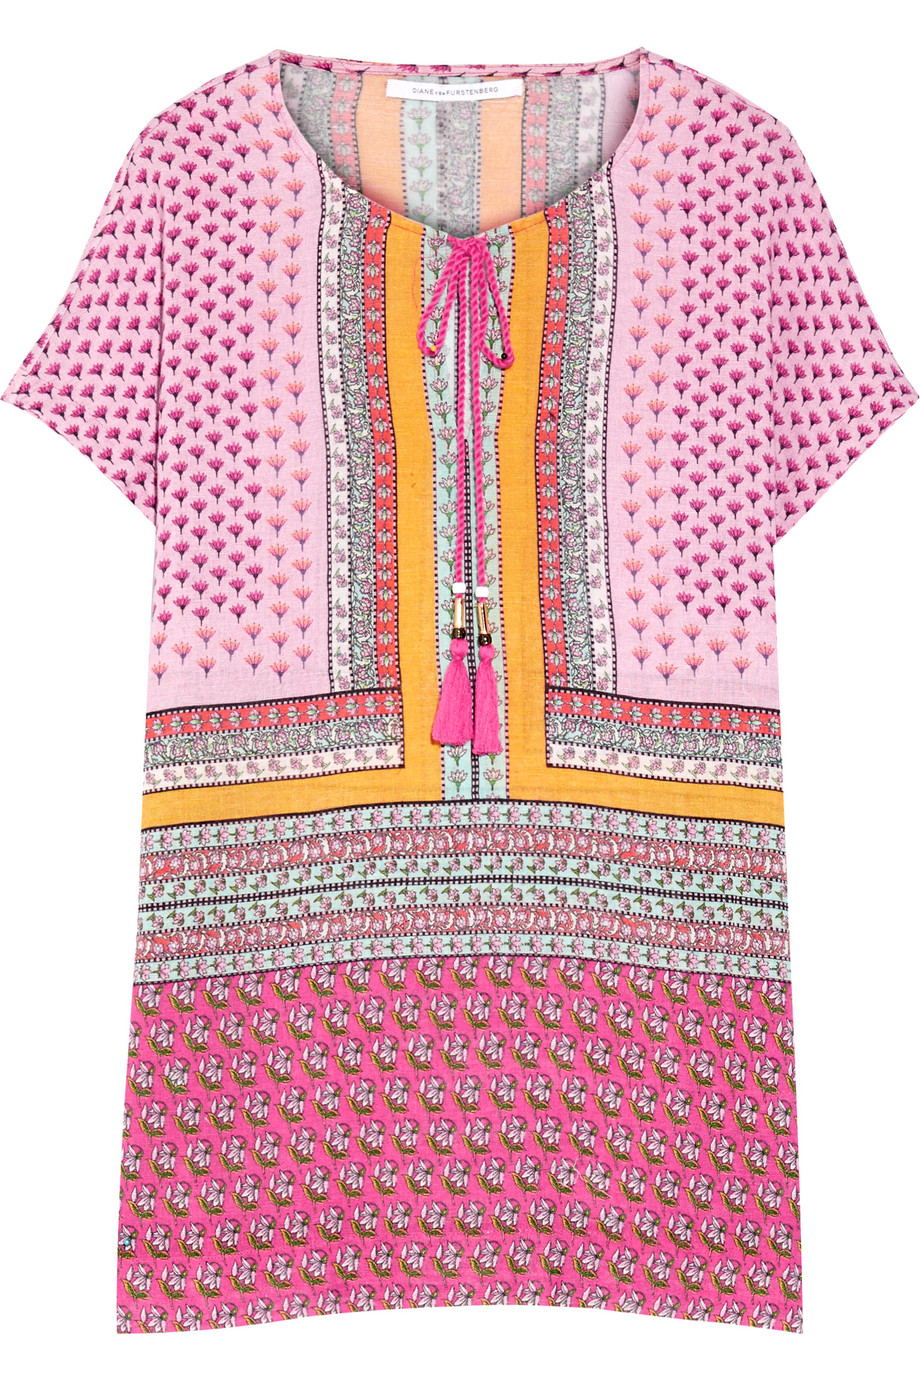 Diane Von Furstenberg Panarea Printed Linen and Cotton-Blend Gauze Kaftan, Pink, Women's - Printed, Size: XS